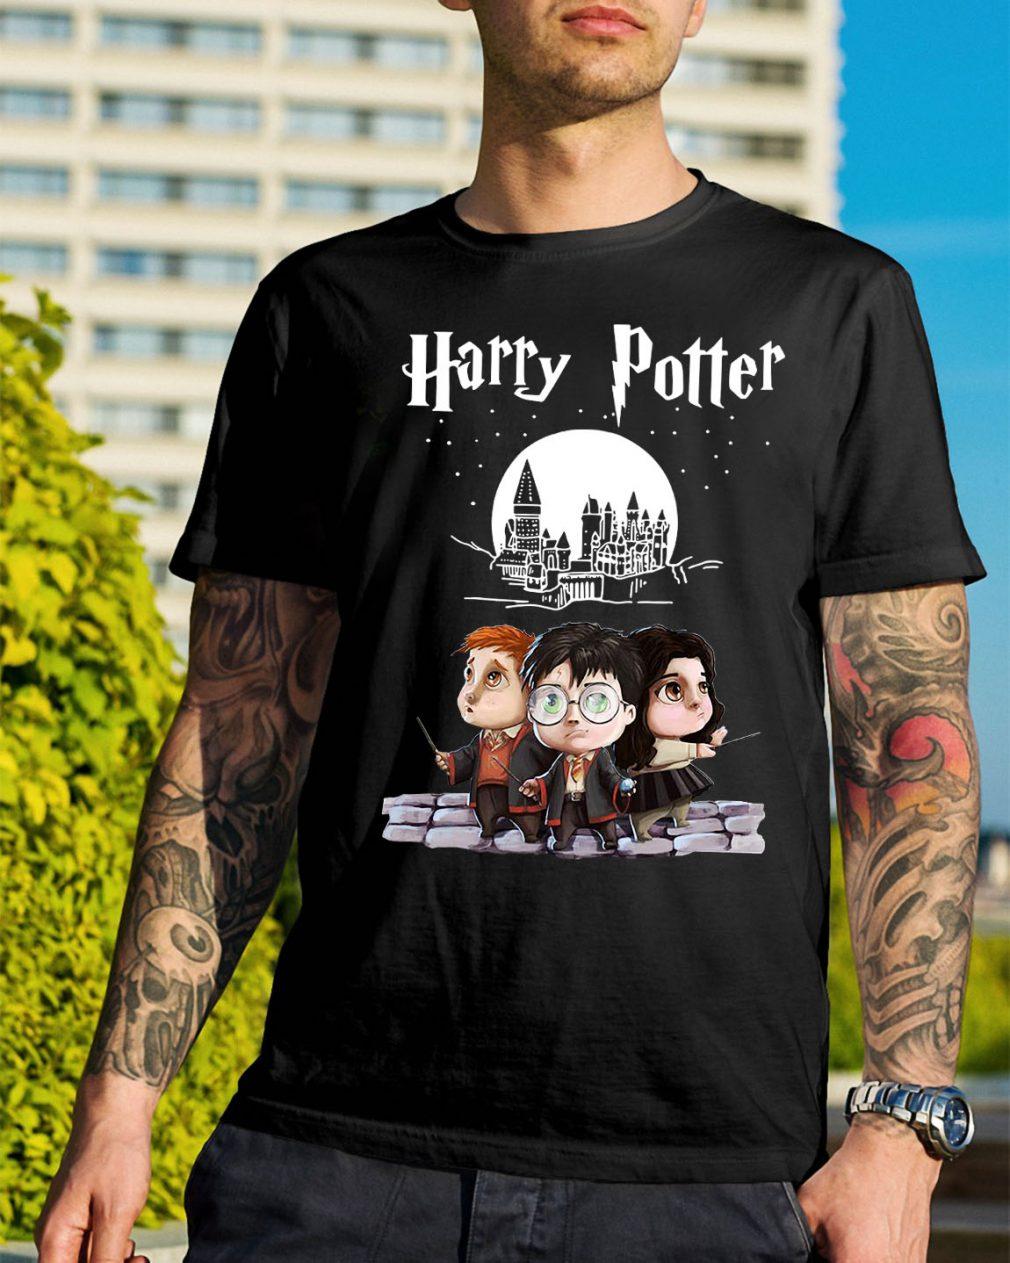 Harry Potter chibi shirt